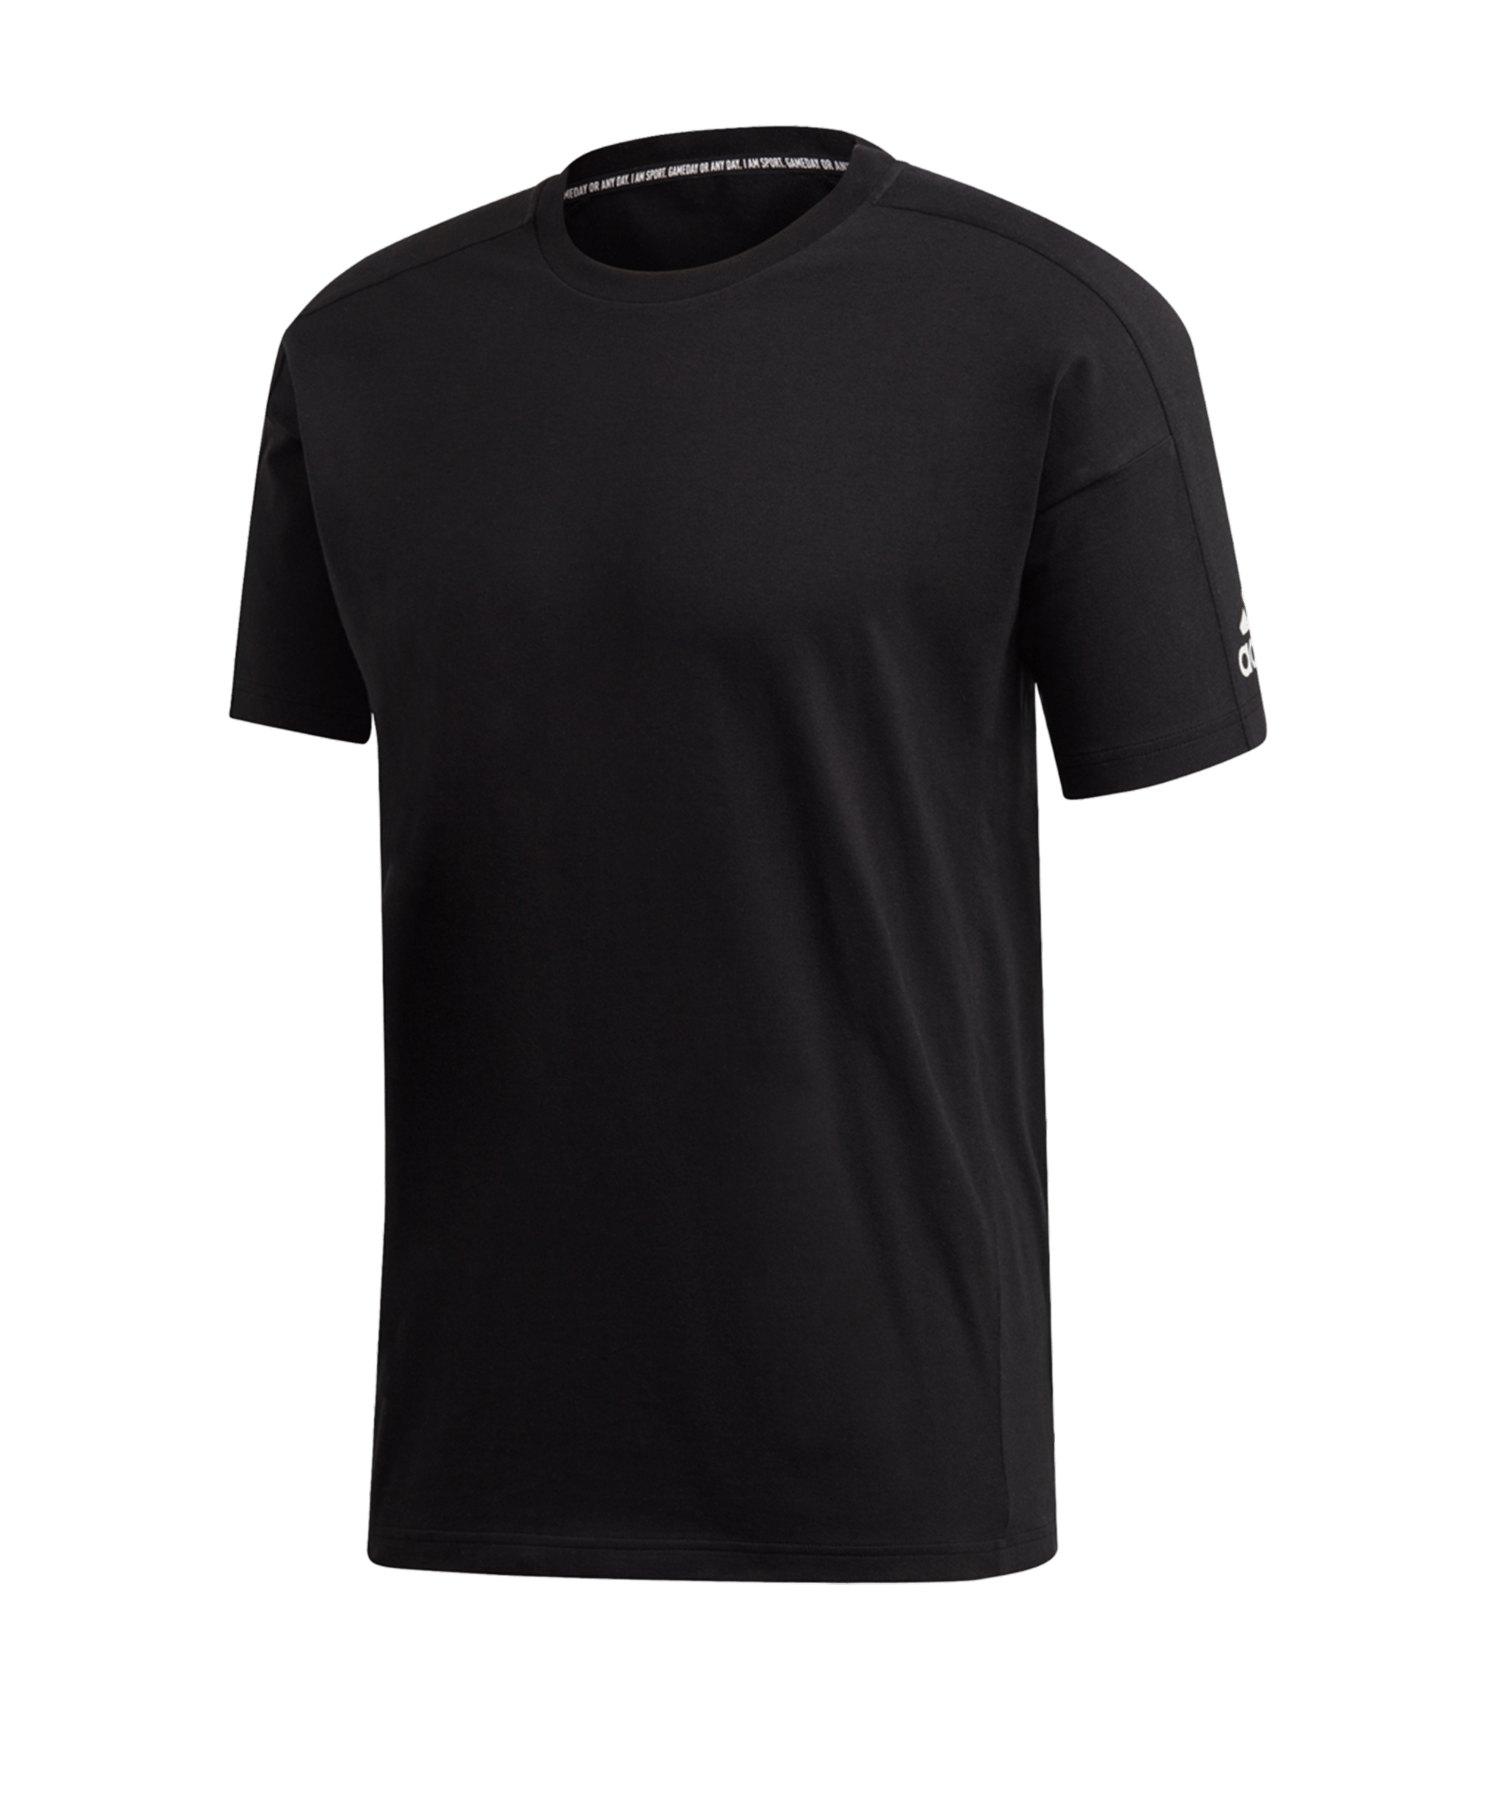 adidas MH Plain T-Shirt Schwarz - schwarz